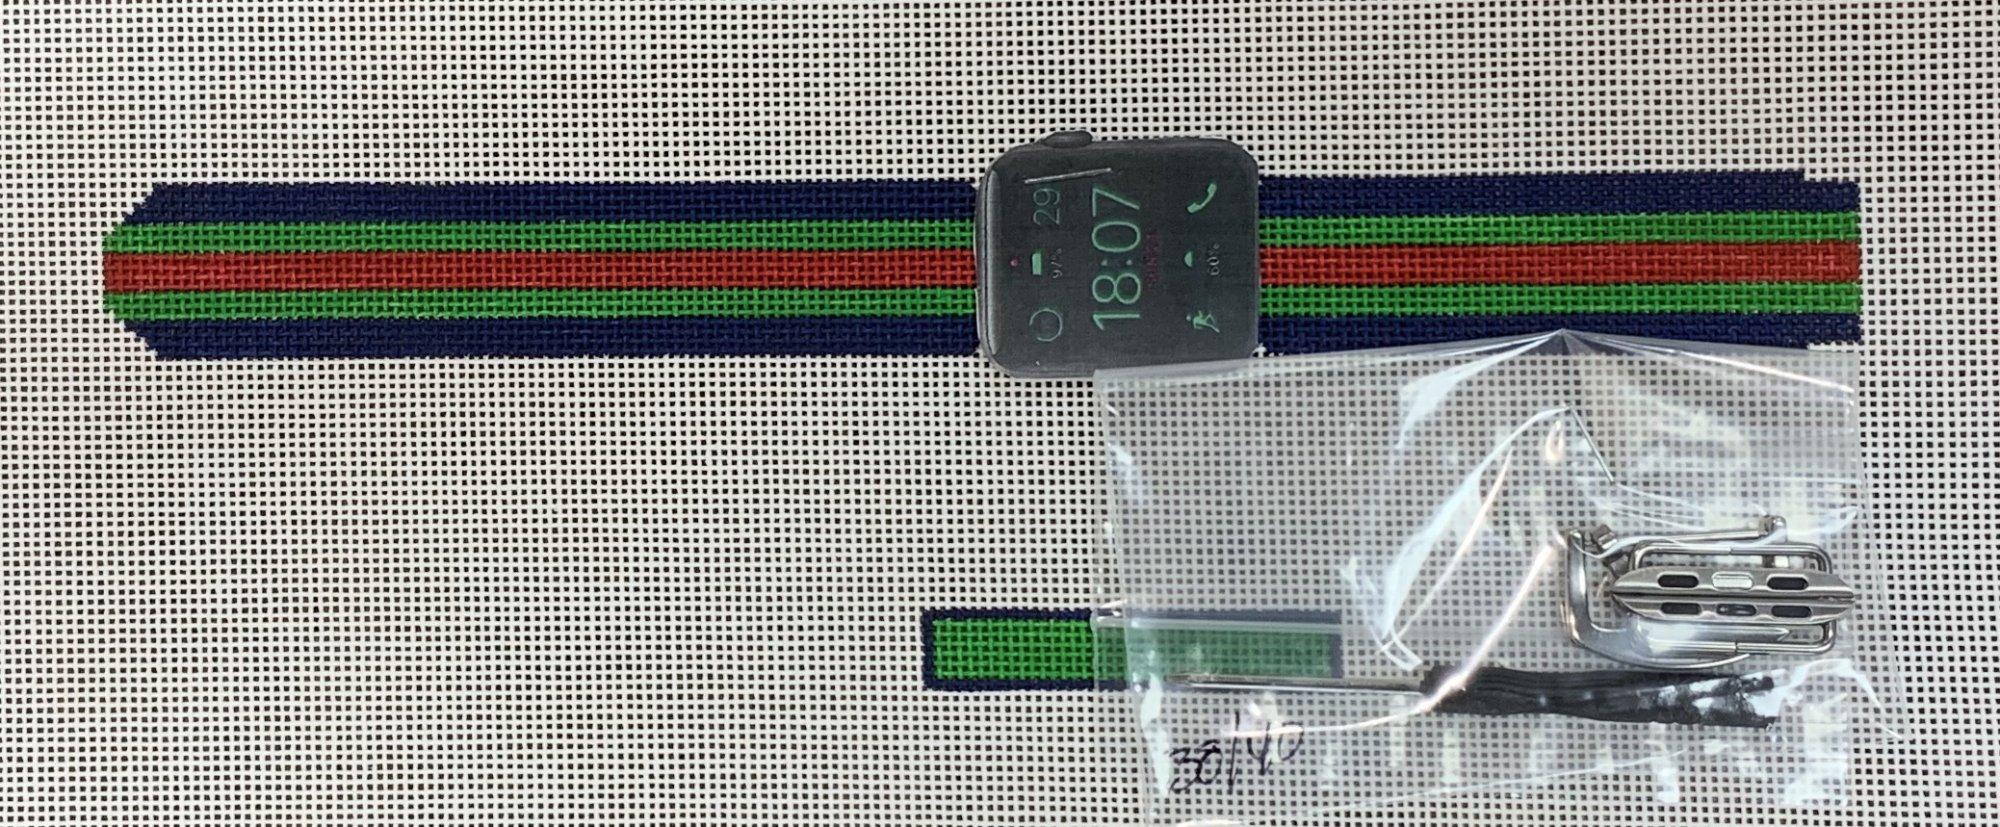 Apple Watch Band (Kit) - Stripes